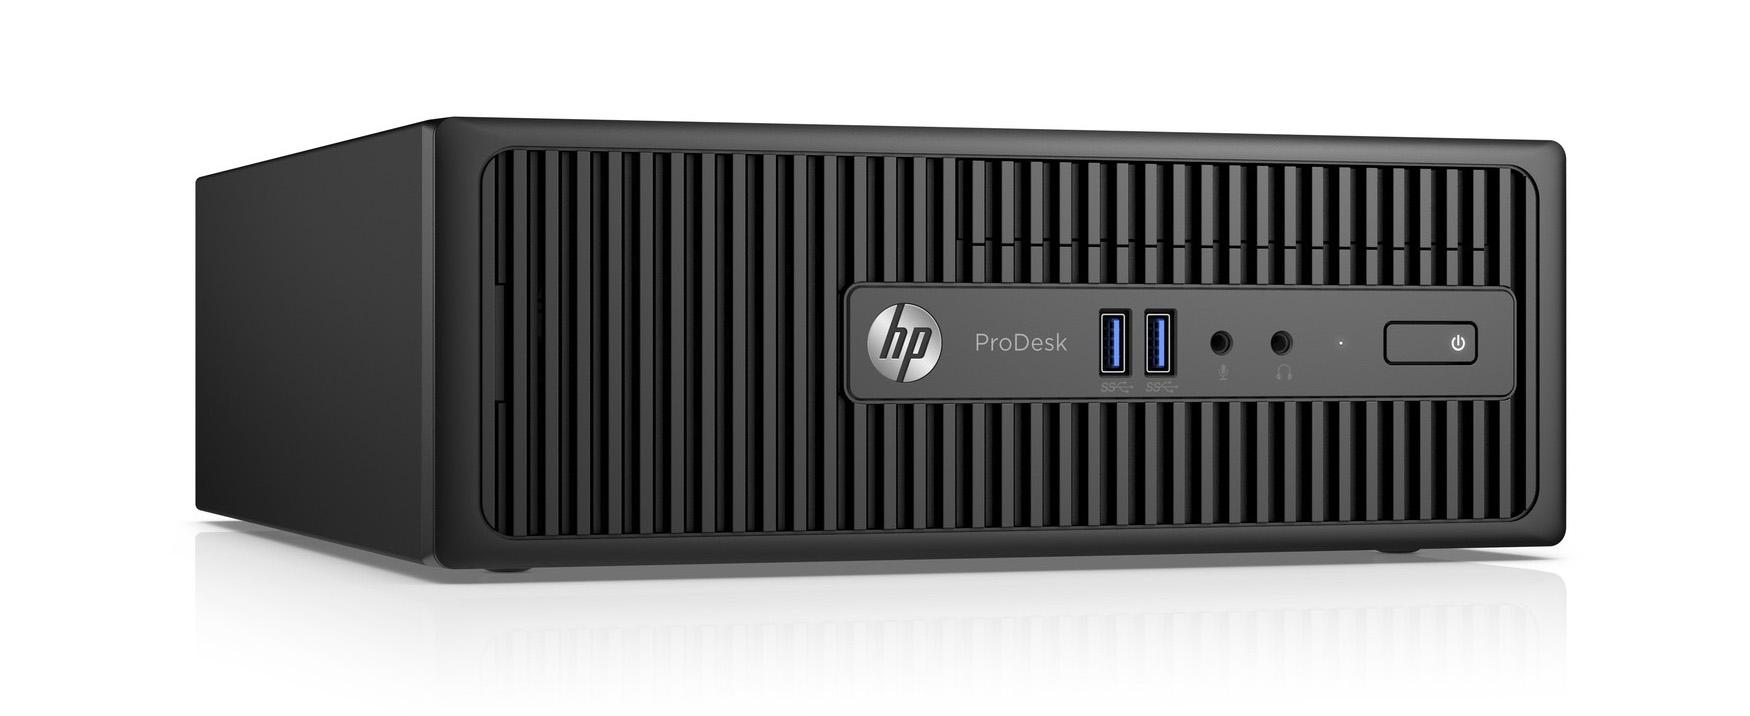 HP 430 G3 - face avant